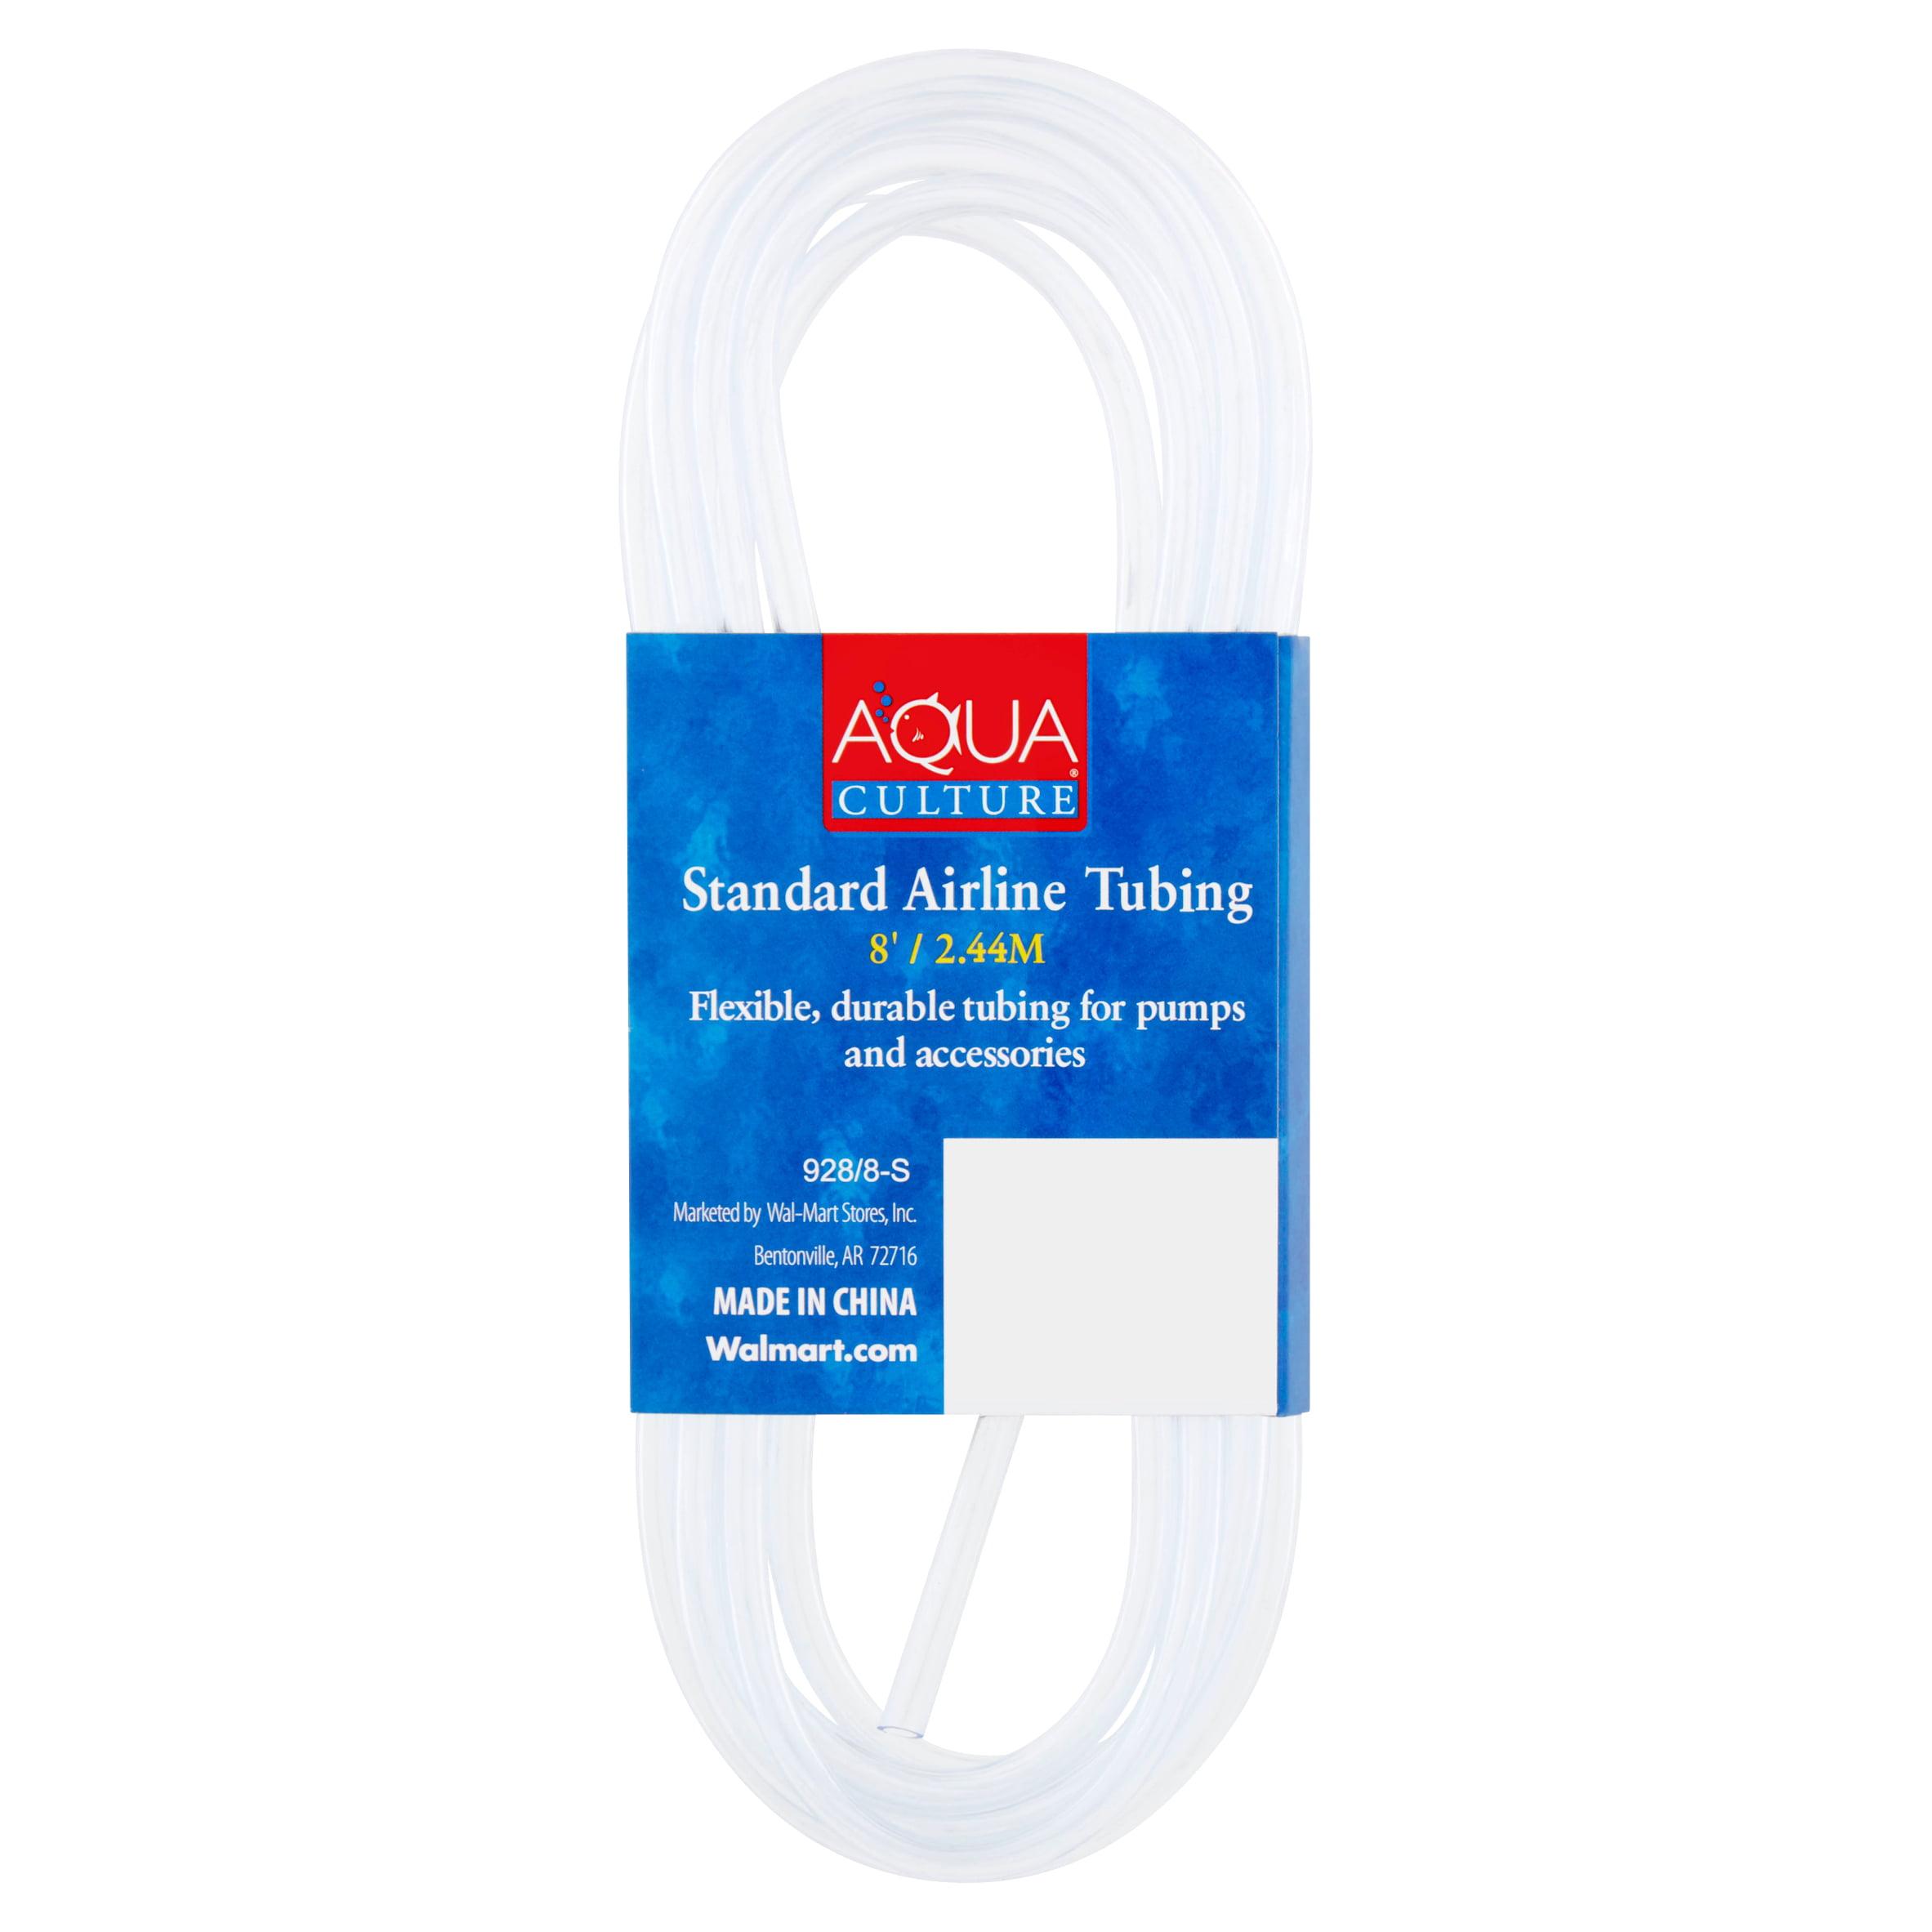 Aqua Culture 8' Standard Airline Tubing, 8